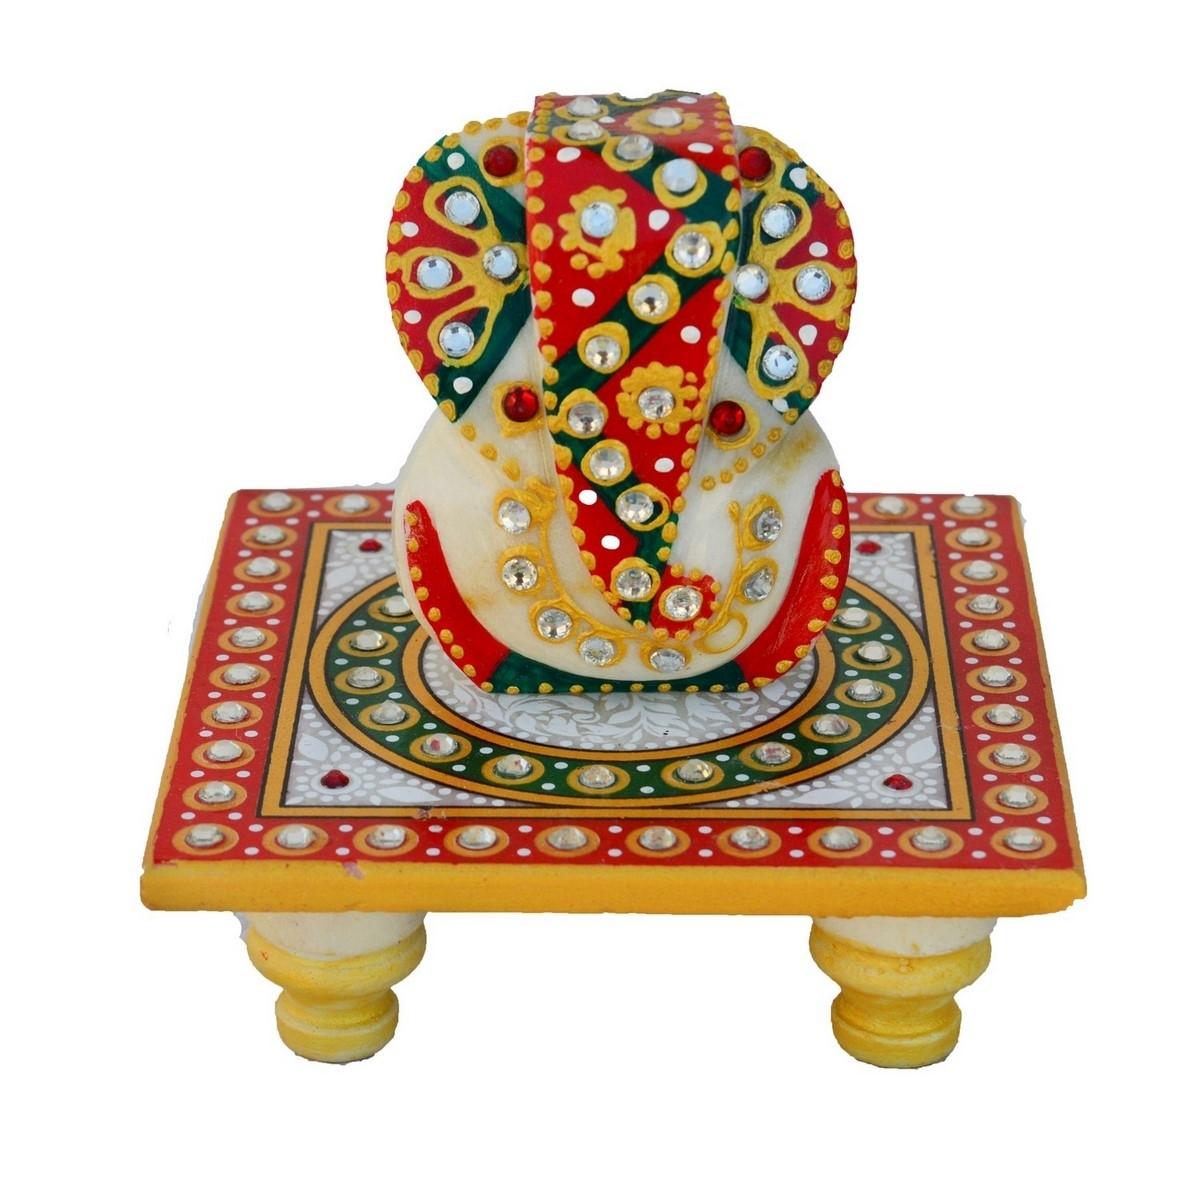 Lord Ganesha on Kundan Studded Marble Chowki Indian Home Decor